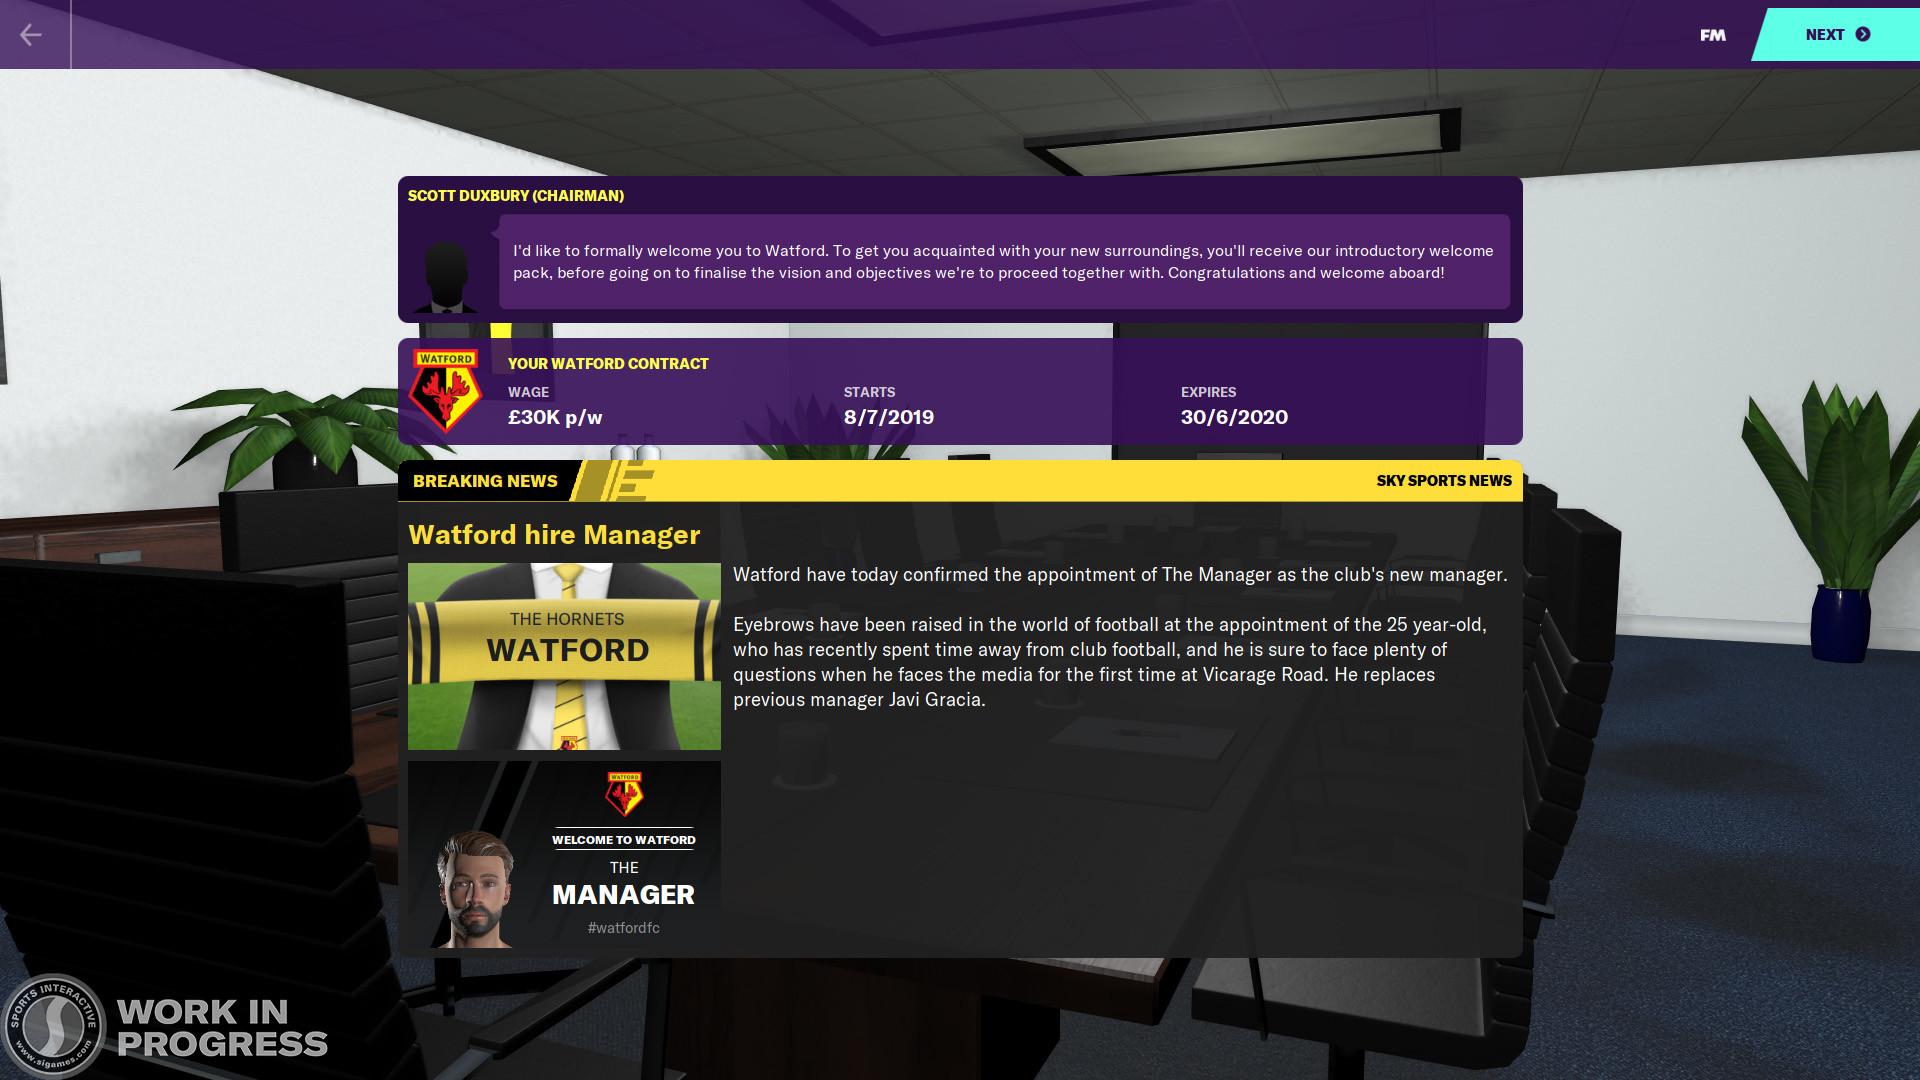 Скриншот 0 - Football Manager 2020 [АВТОАКТИВАЦИЯ]+In-Game Editor+Бонус предзаказа (Region Free)[Оффлайн аккаунт Steam ]